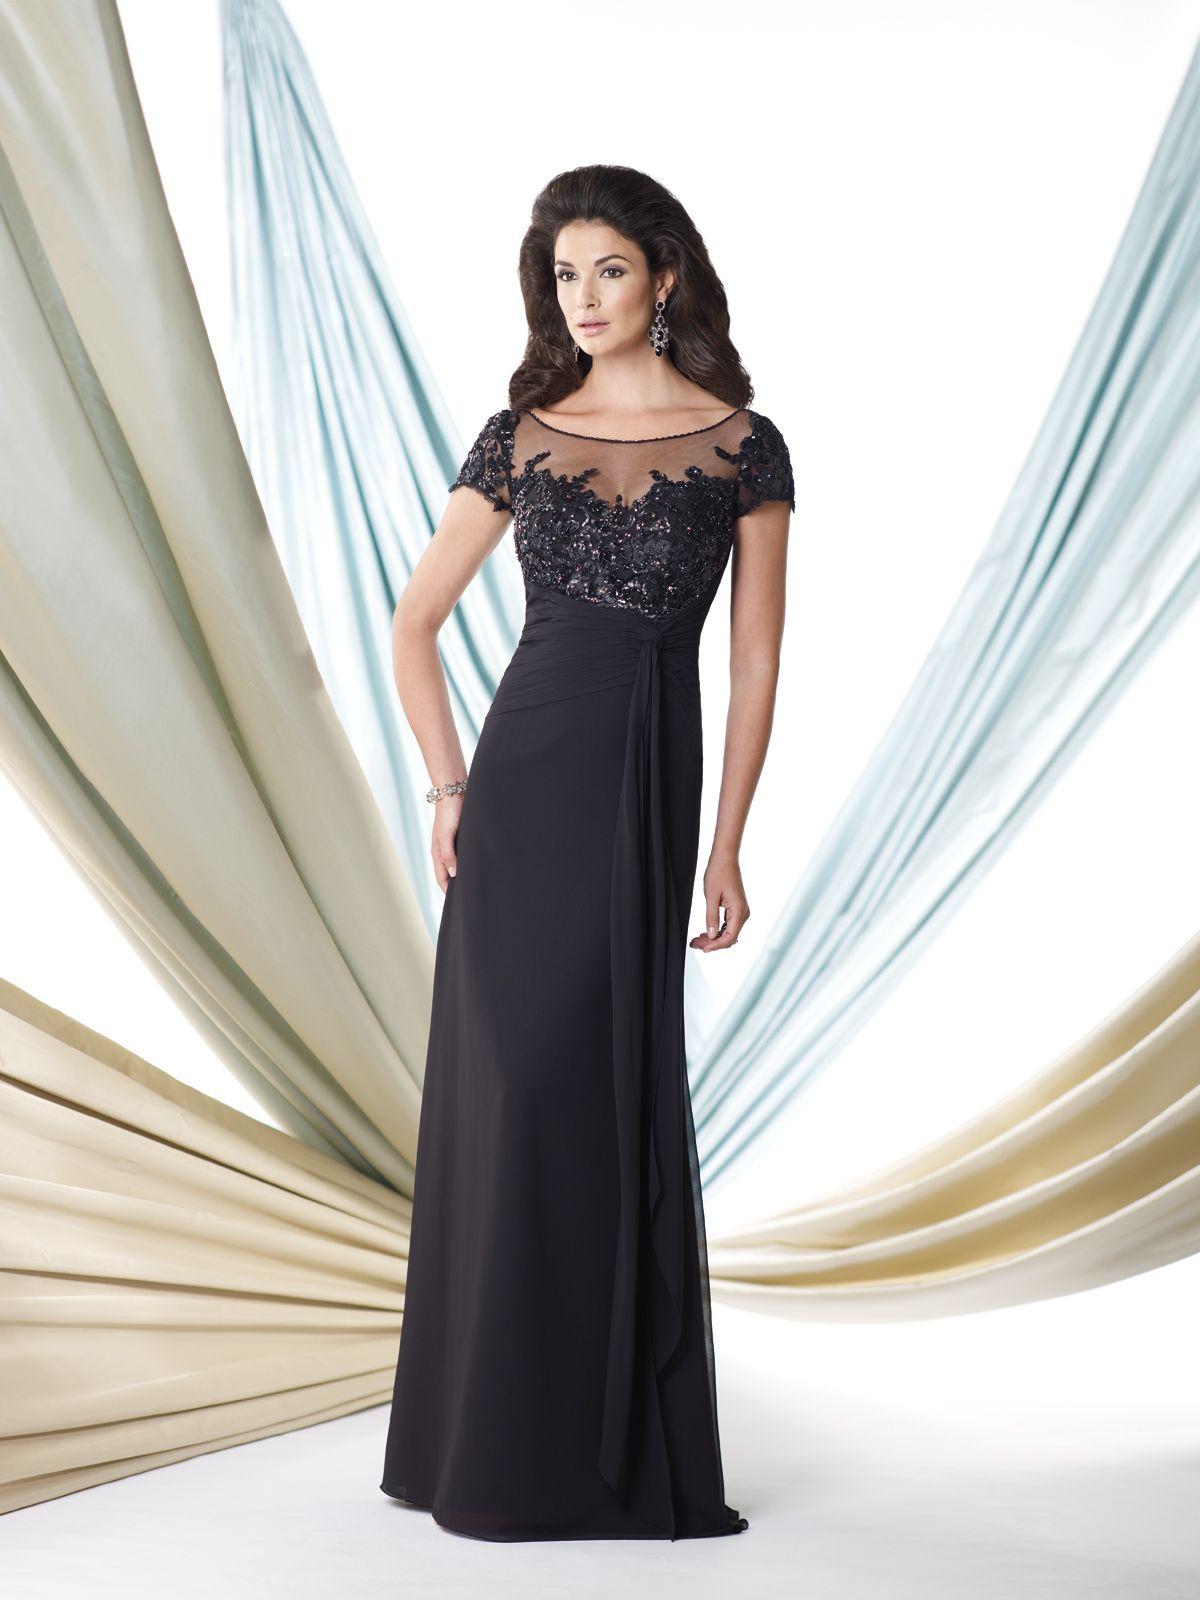 Sheath Illusion Neckline Black Chiffon Beaded Mother Of The Bride Evening Dress Short Sleeve